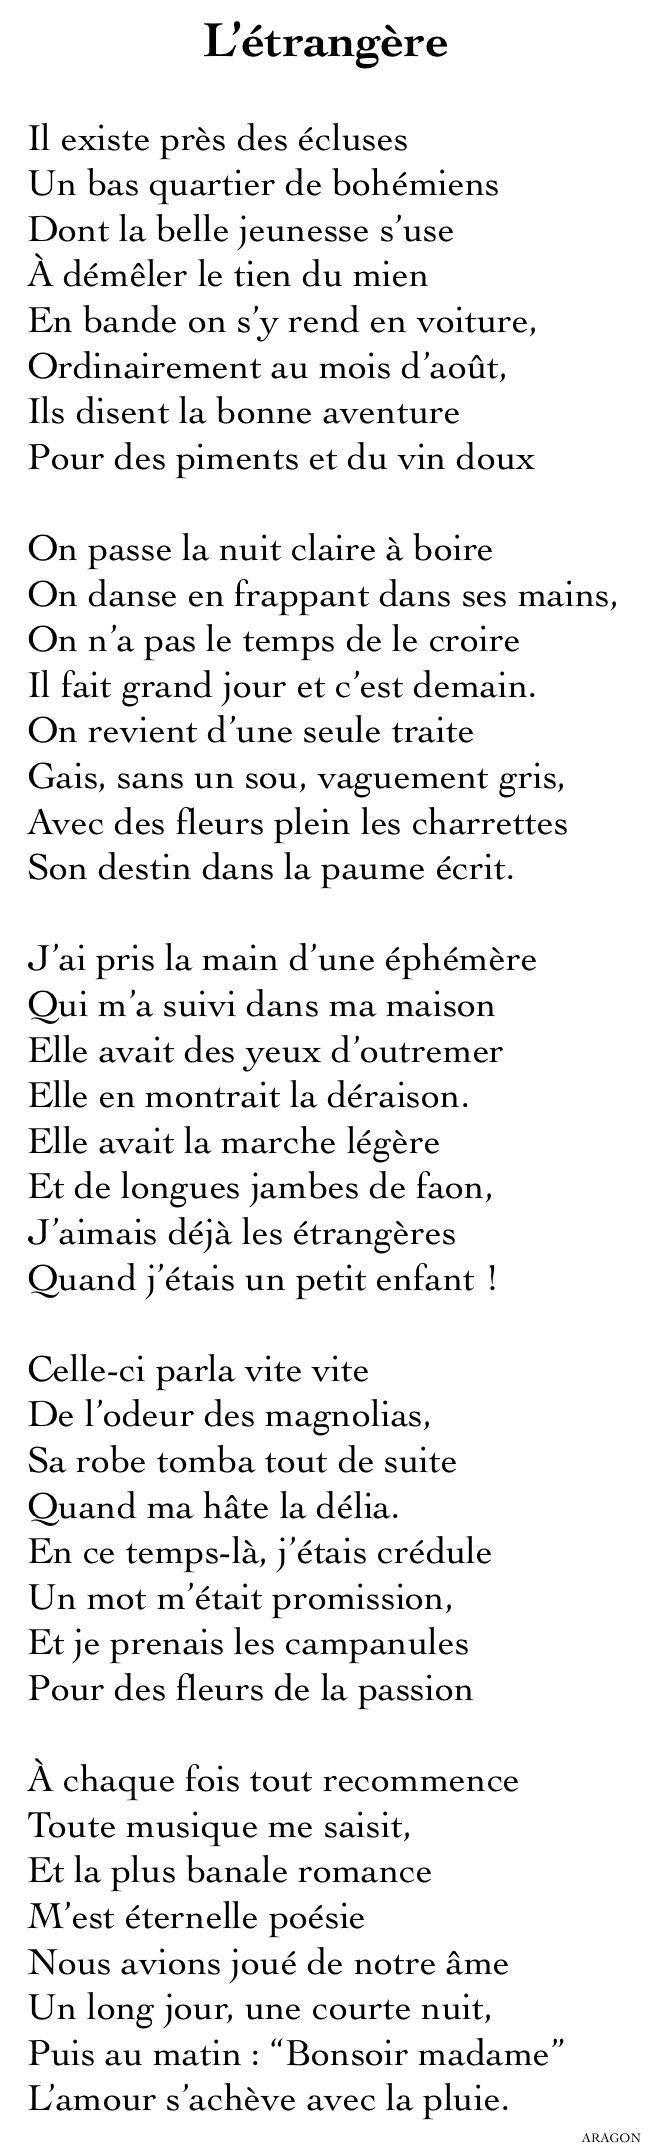 L'étrangère - Louis Aragon